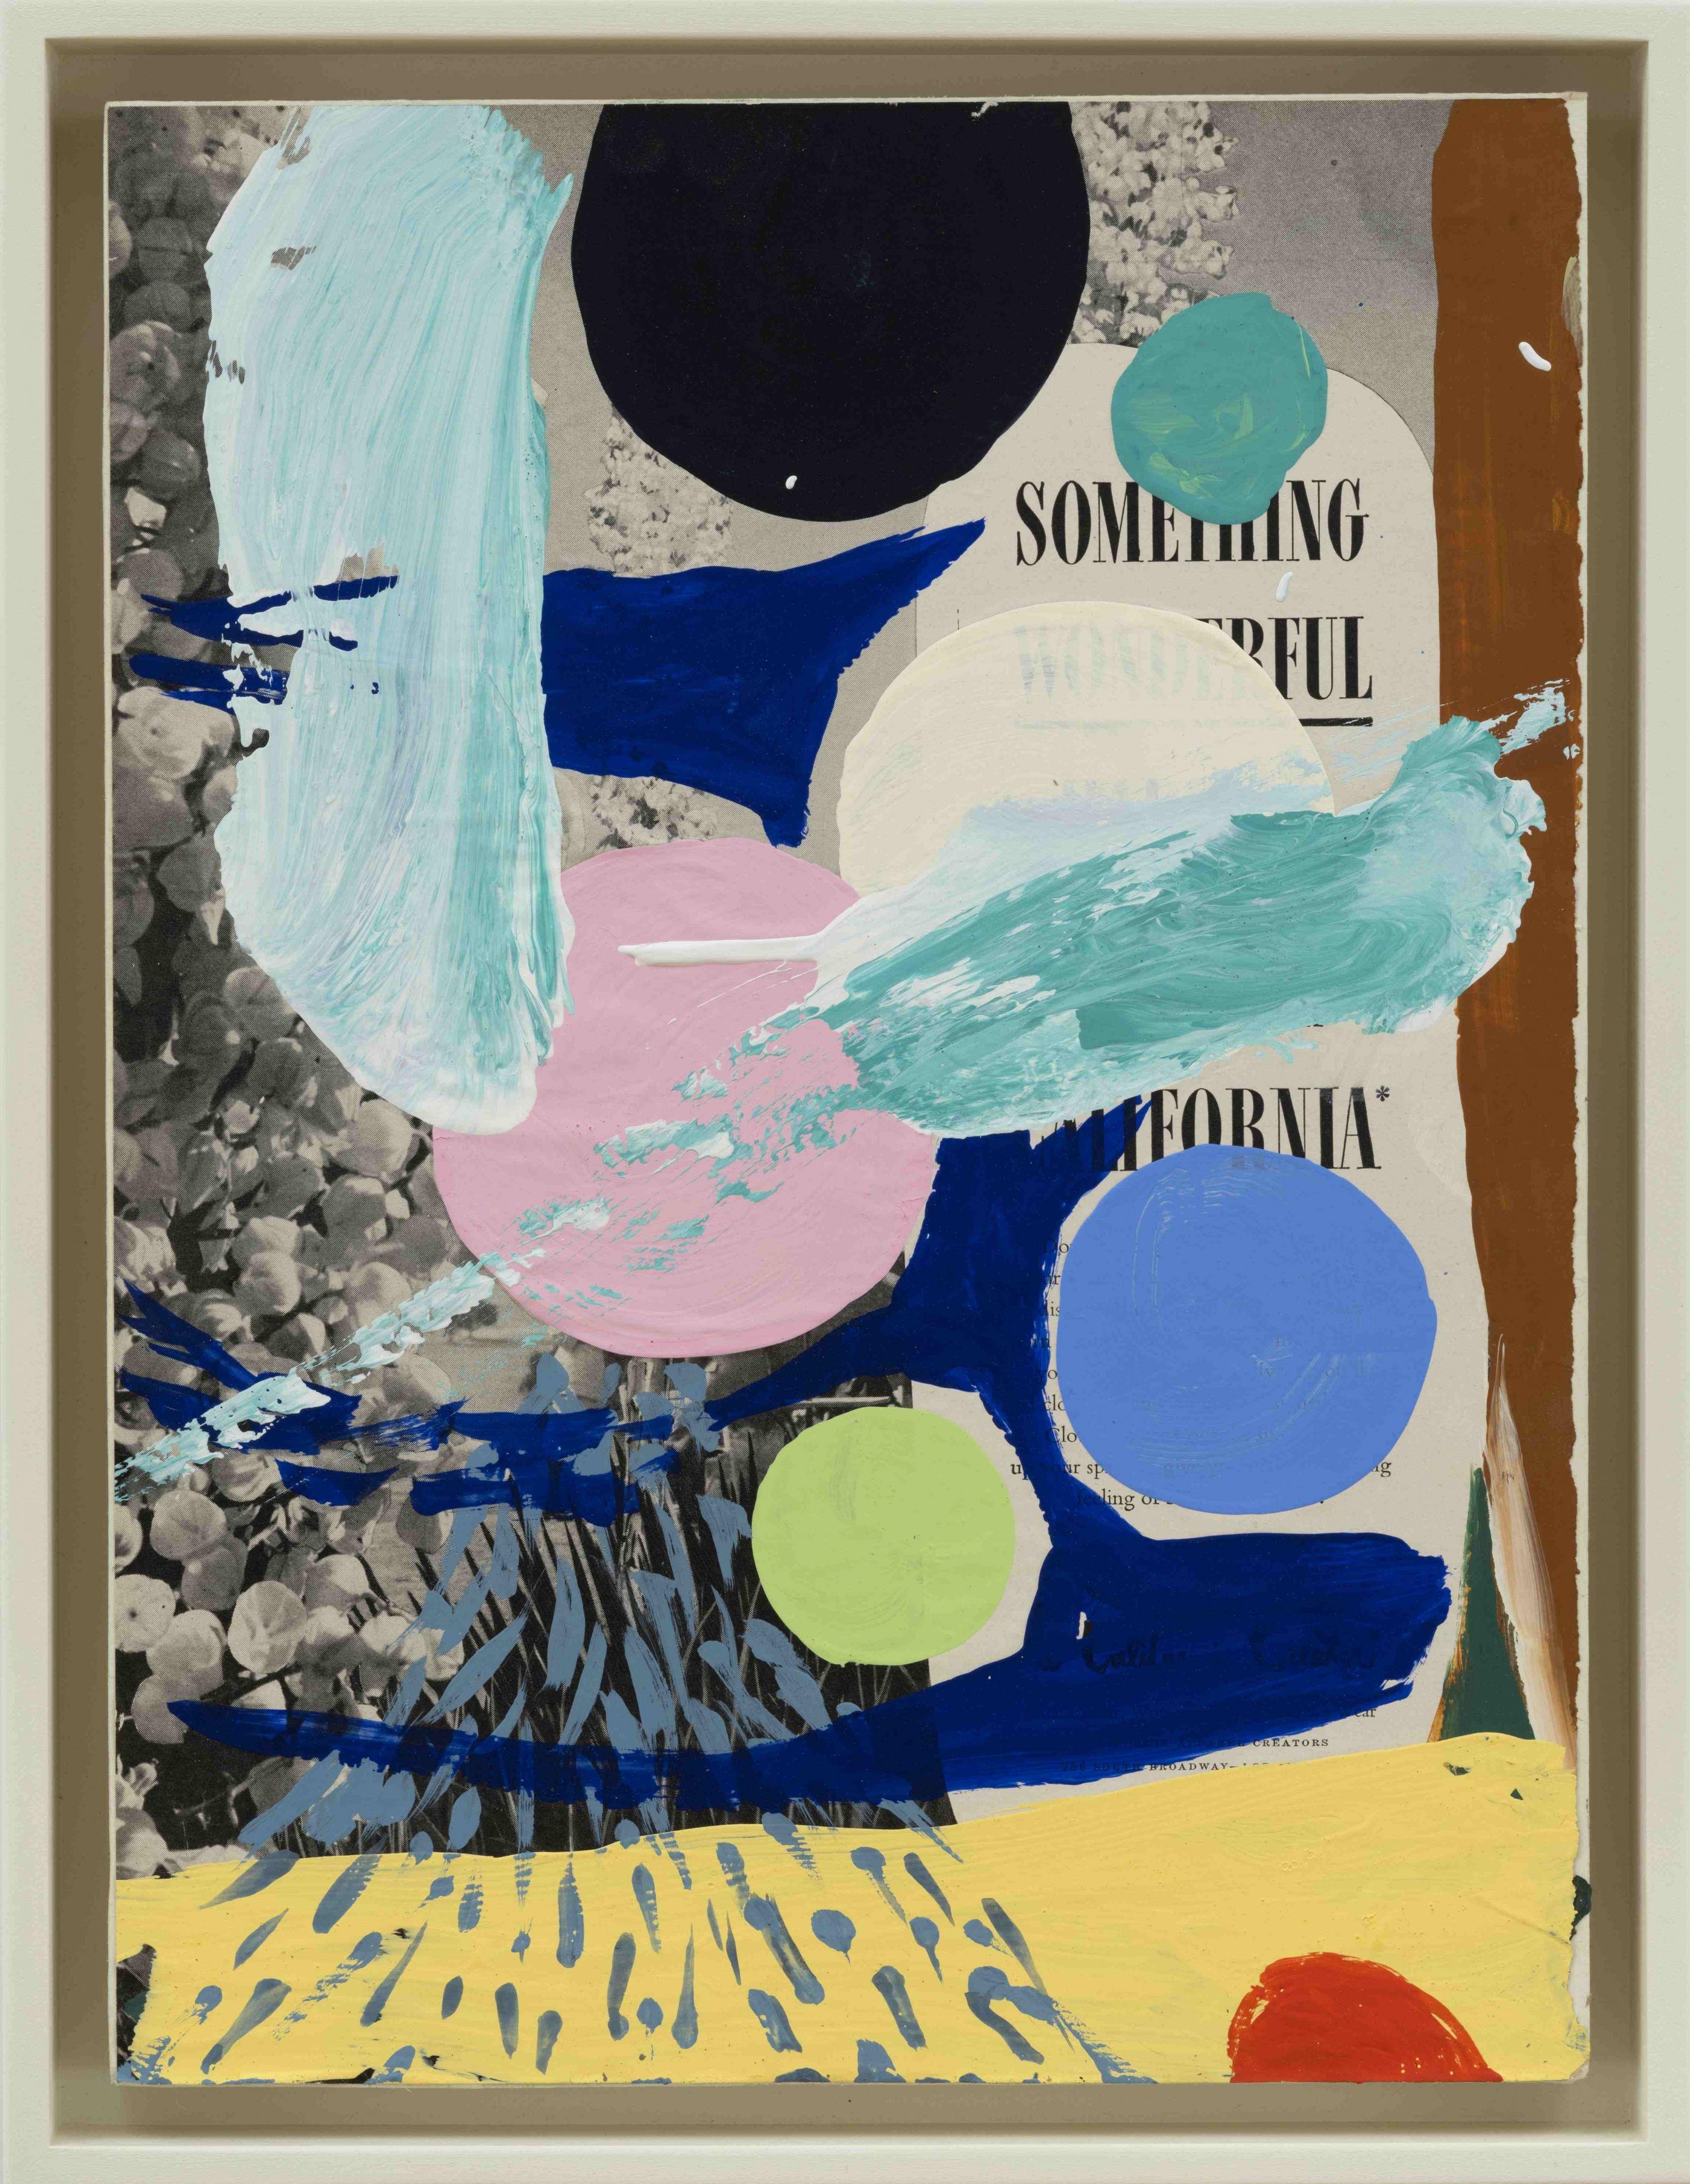 David Salle, Life 47,2016